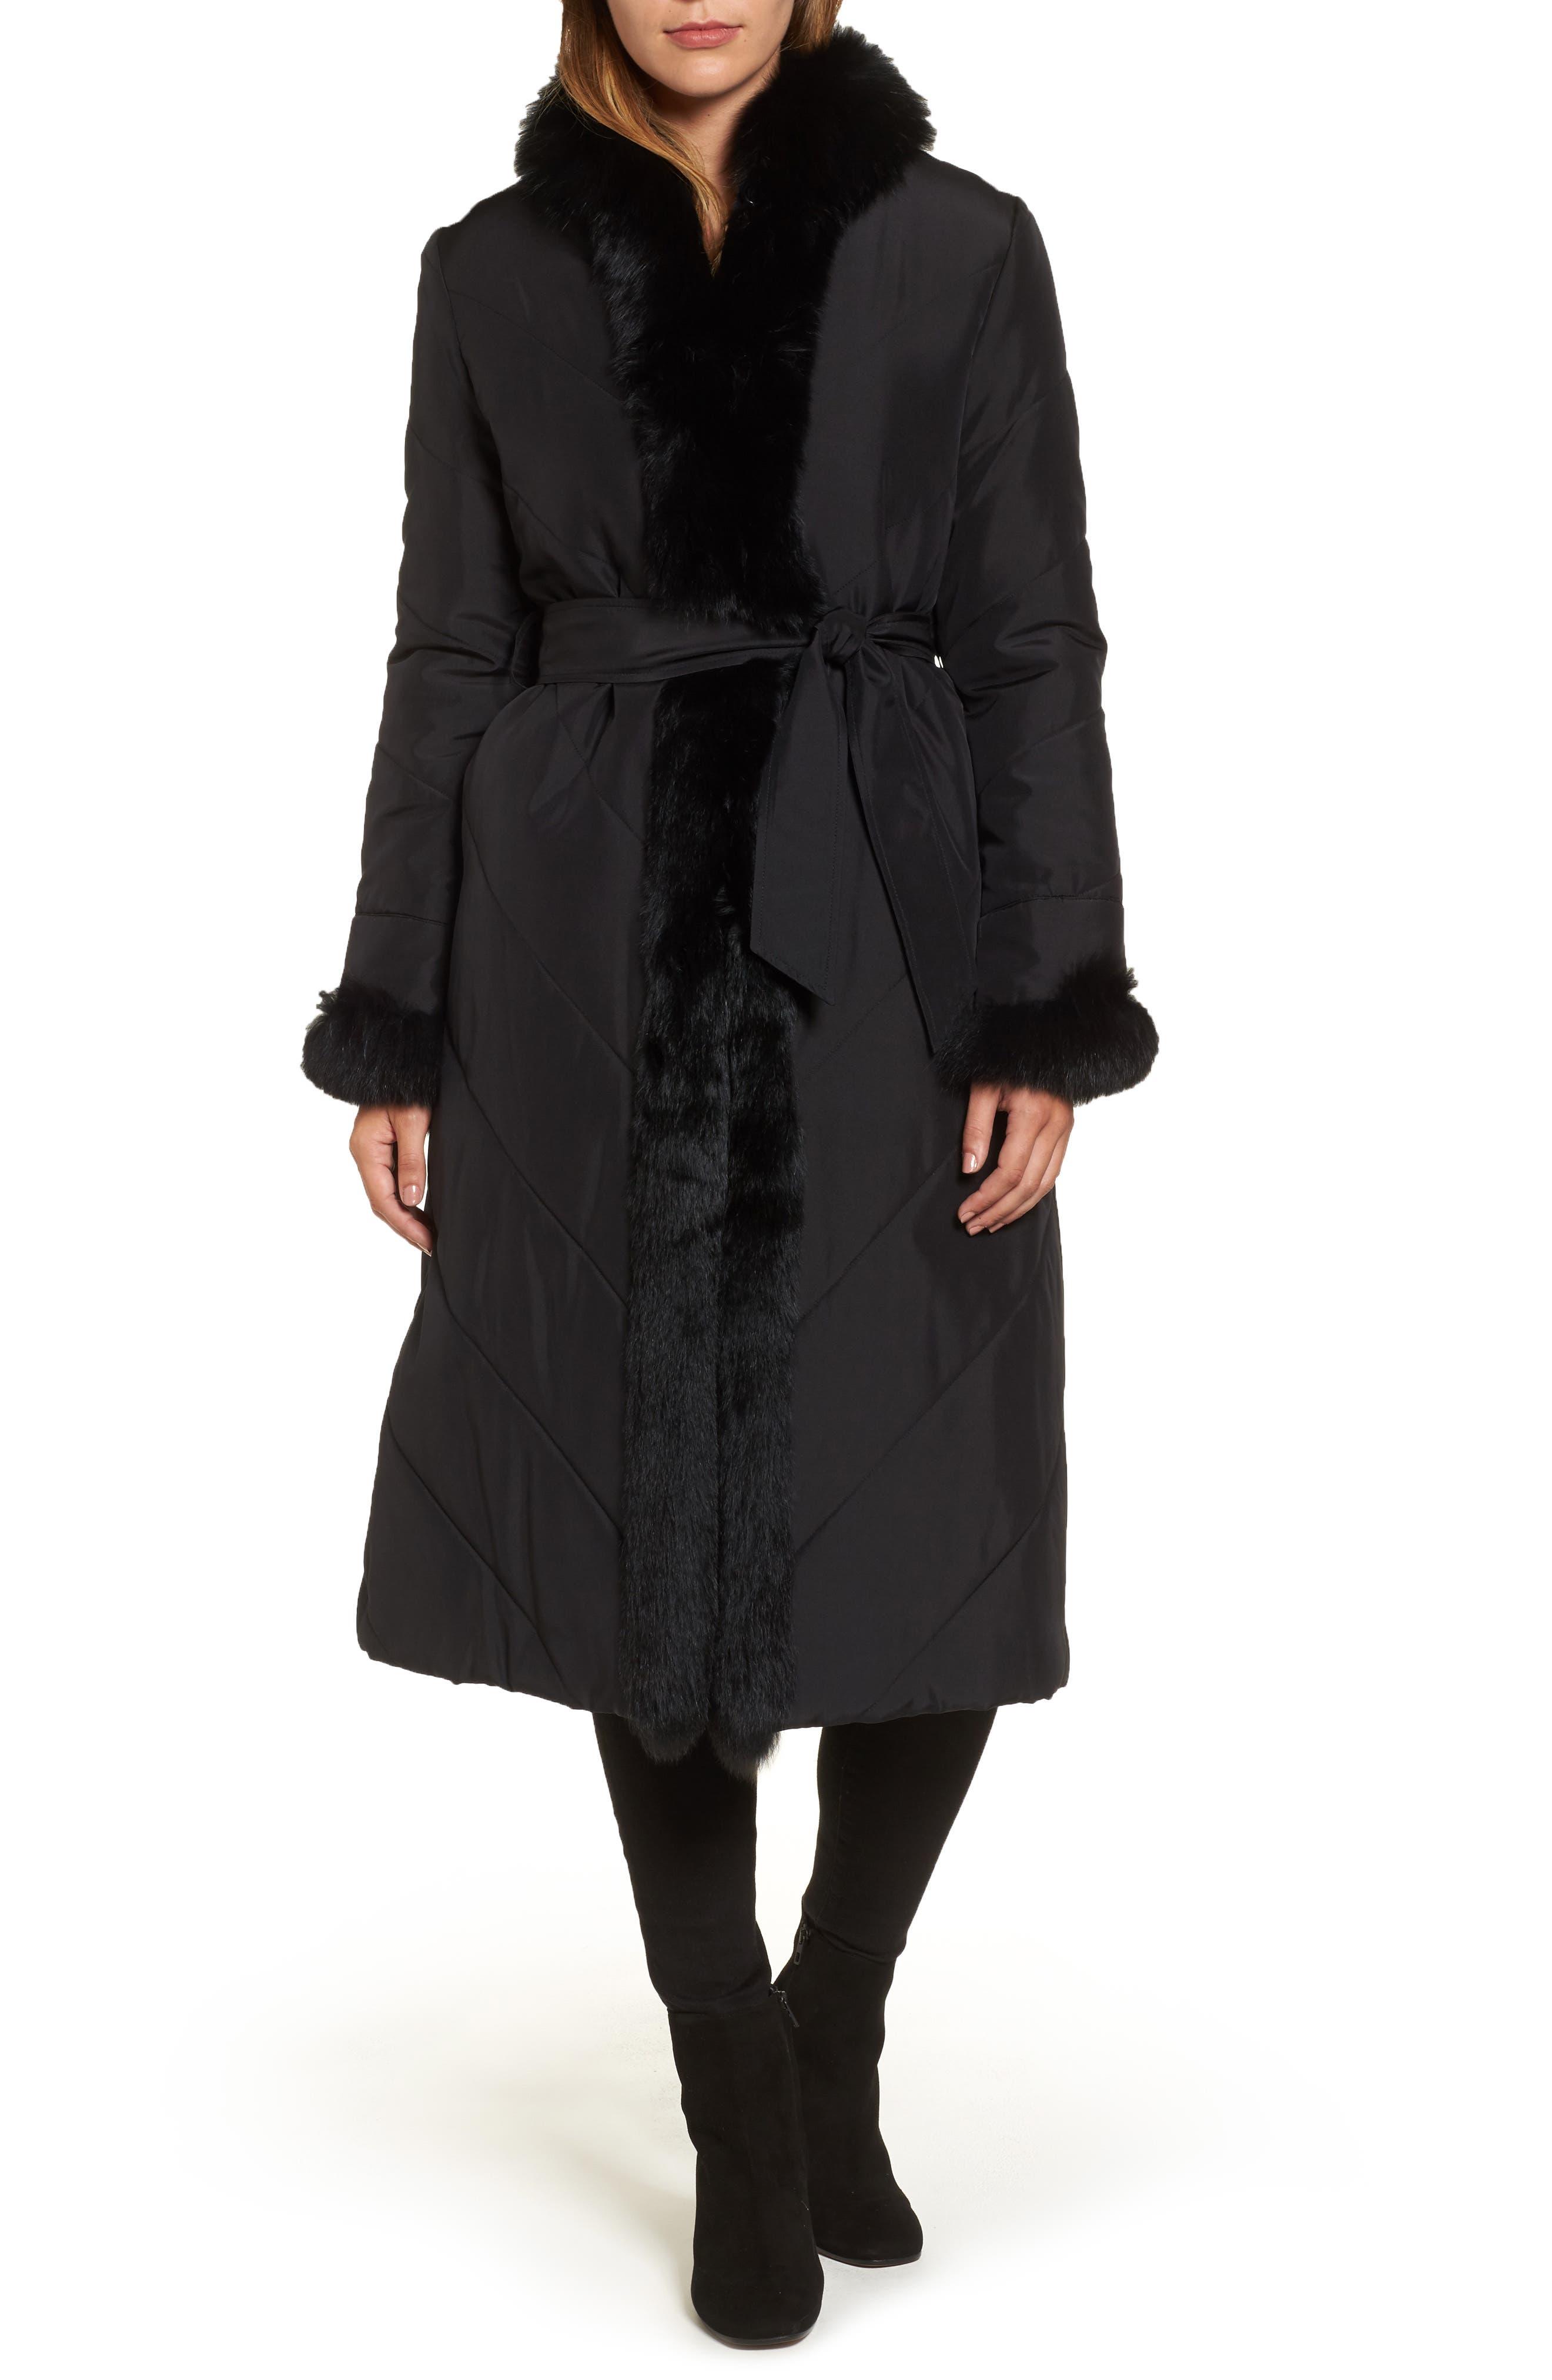 Couture Packable Silk Coat with Genuine Fox Fur & Genuine Rabbit Fur,                         Main,                         color, 001